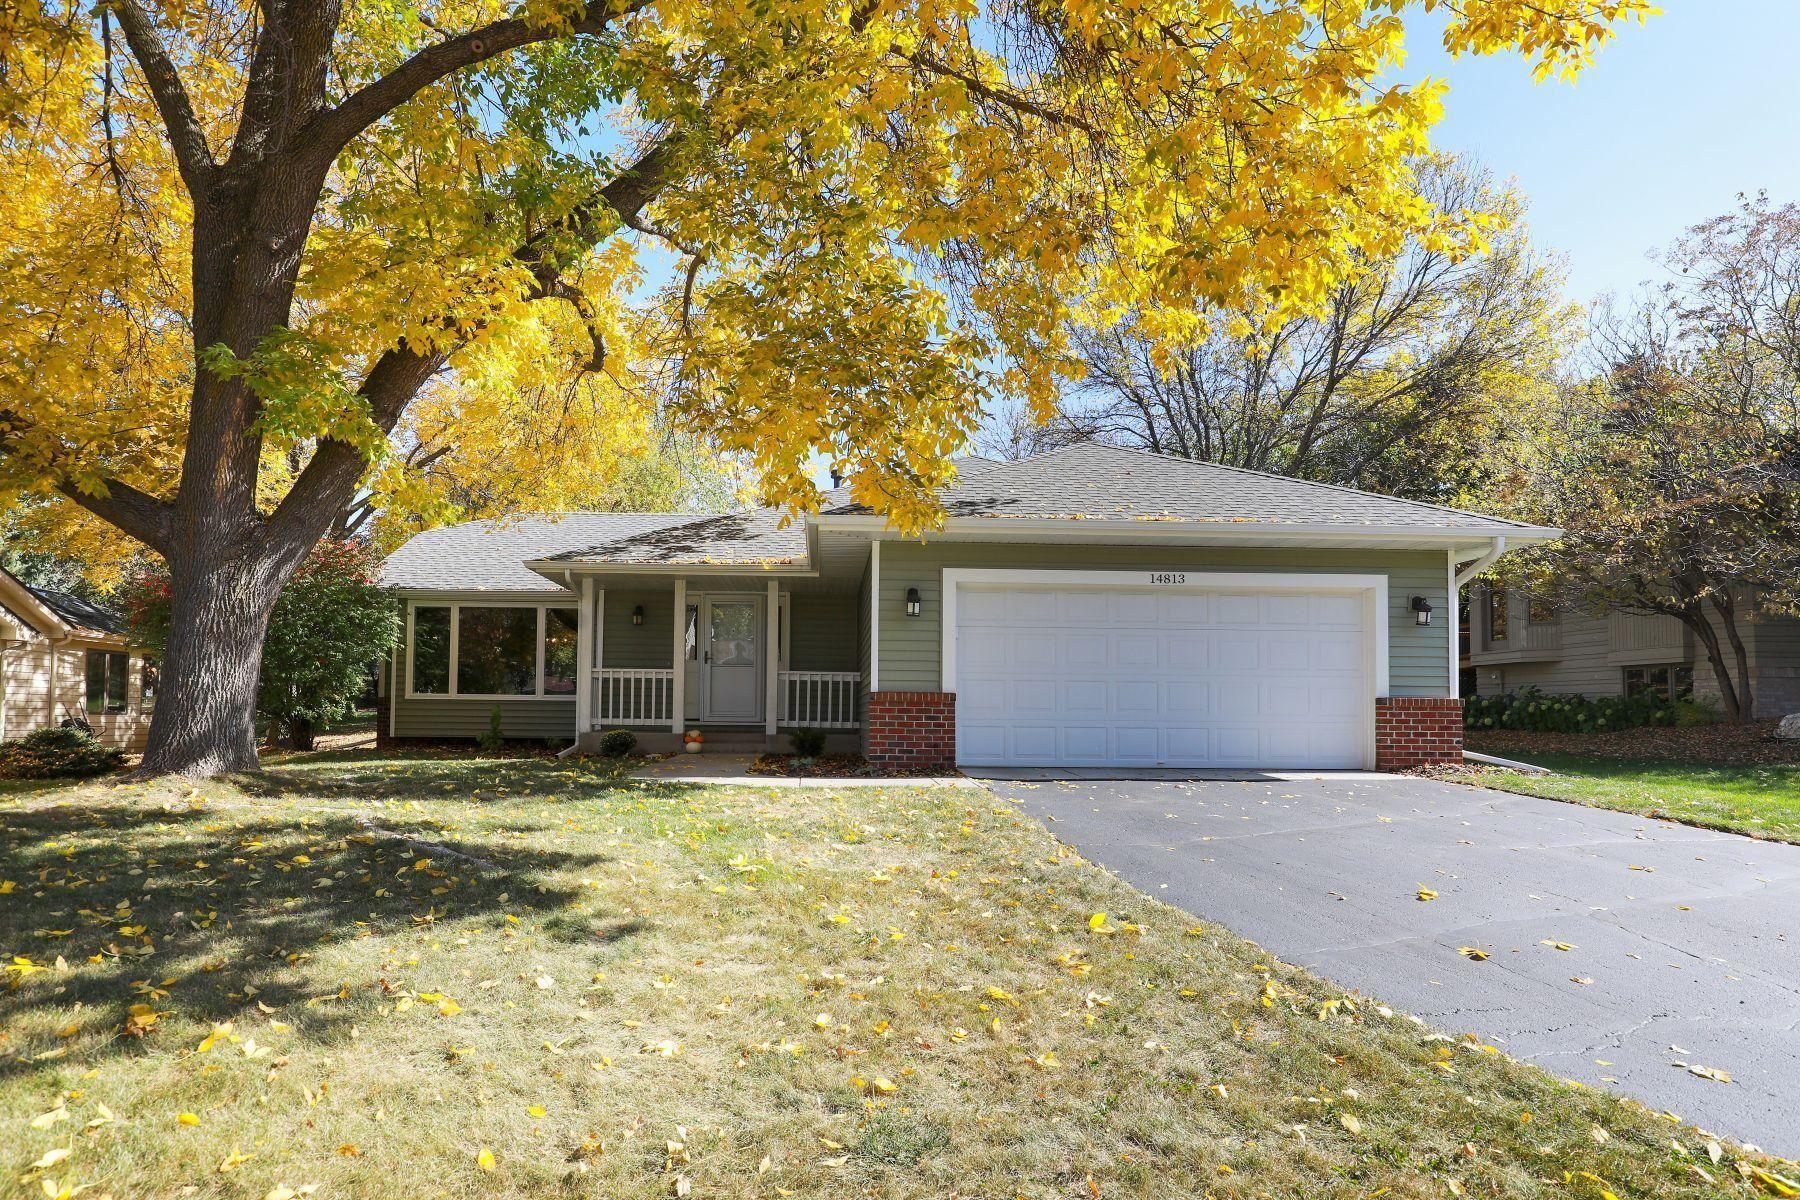 14813 Interlachen Lane, Burnsville, MN 55306 - MLS#: 5671565